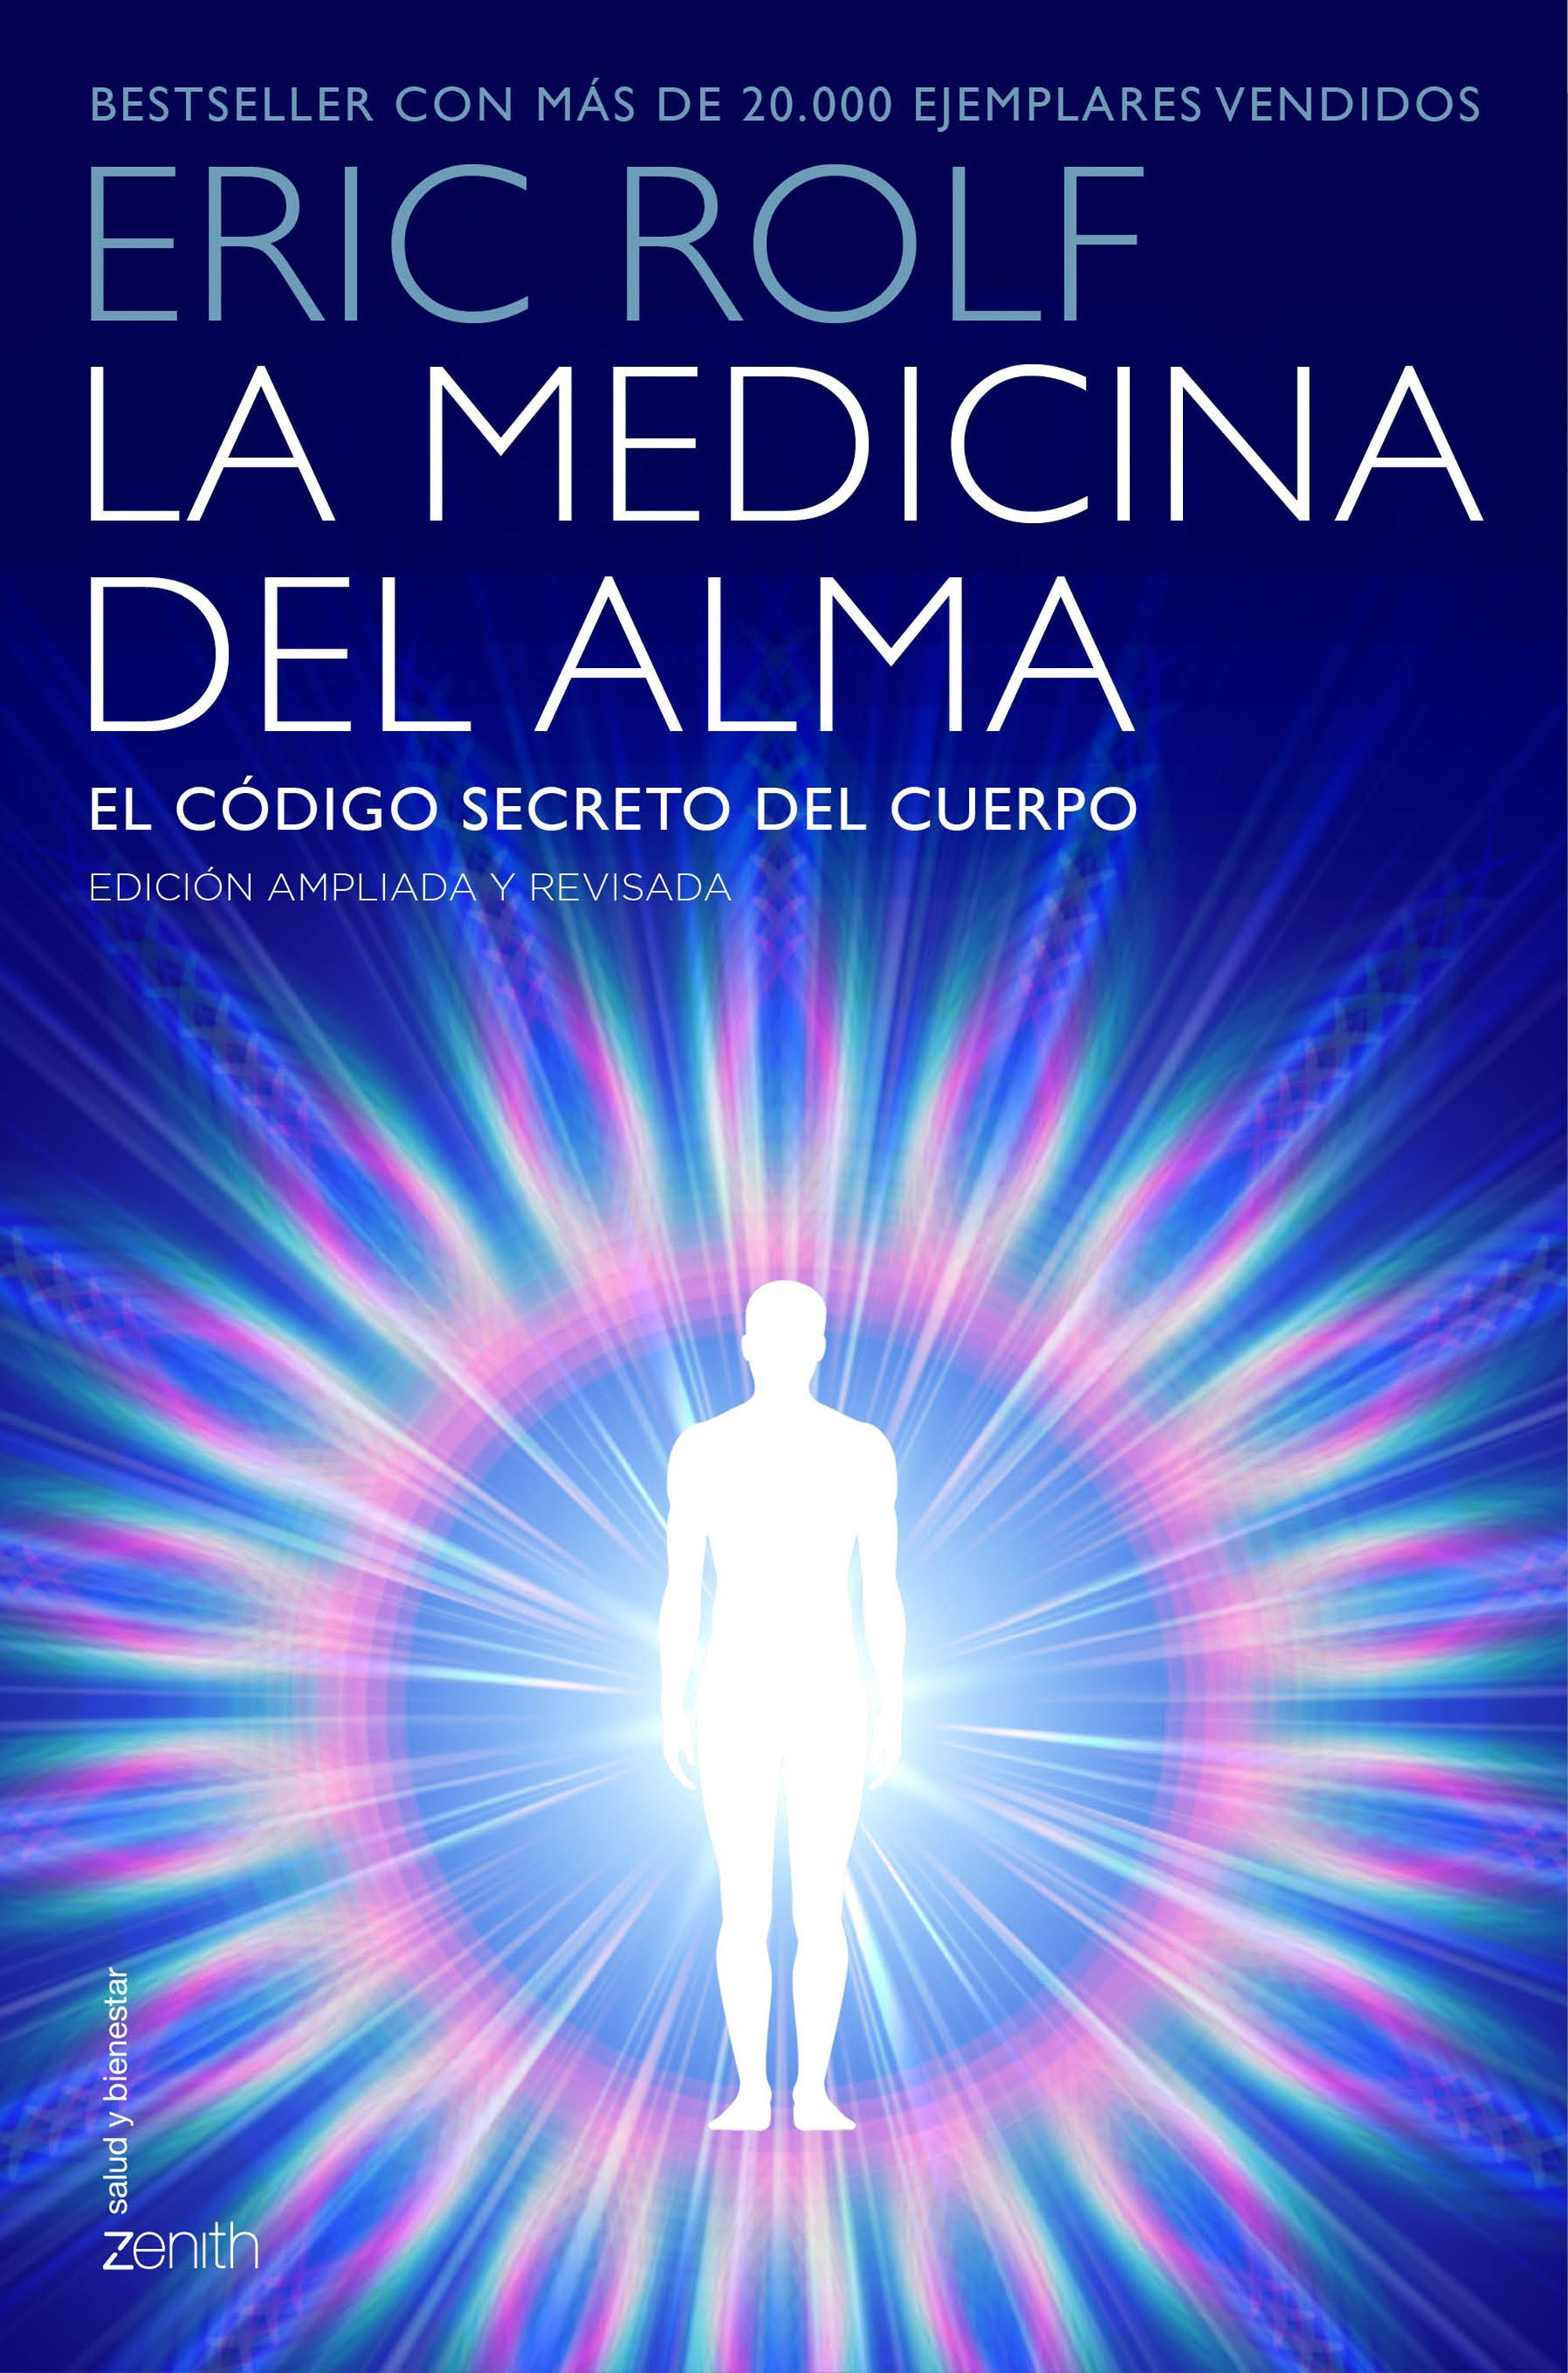 Livinpsychic blog download free sanacion espiritual e inmortalidad pdf to jpg fandeluxe Images